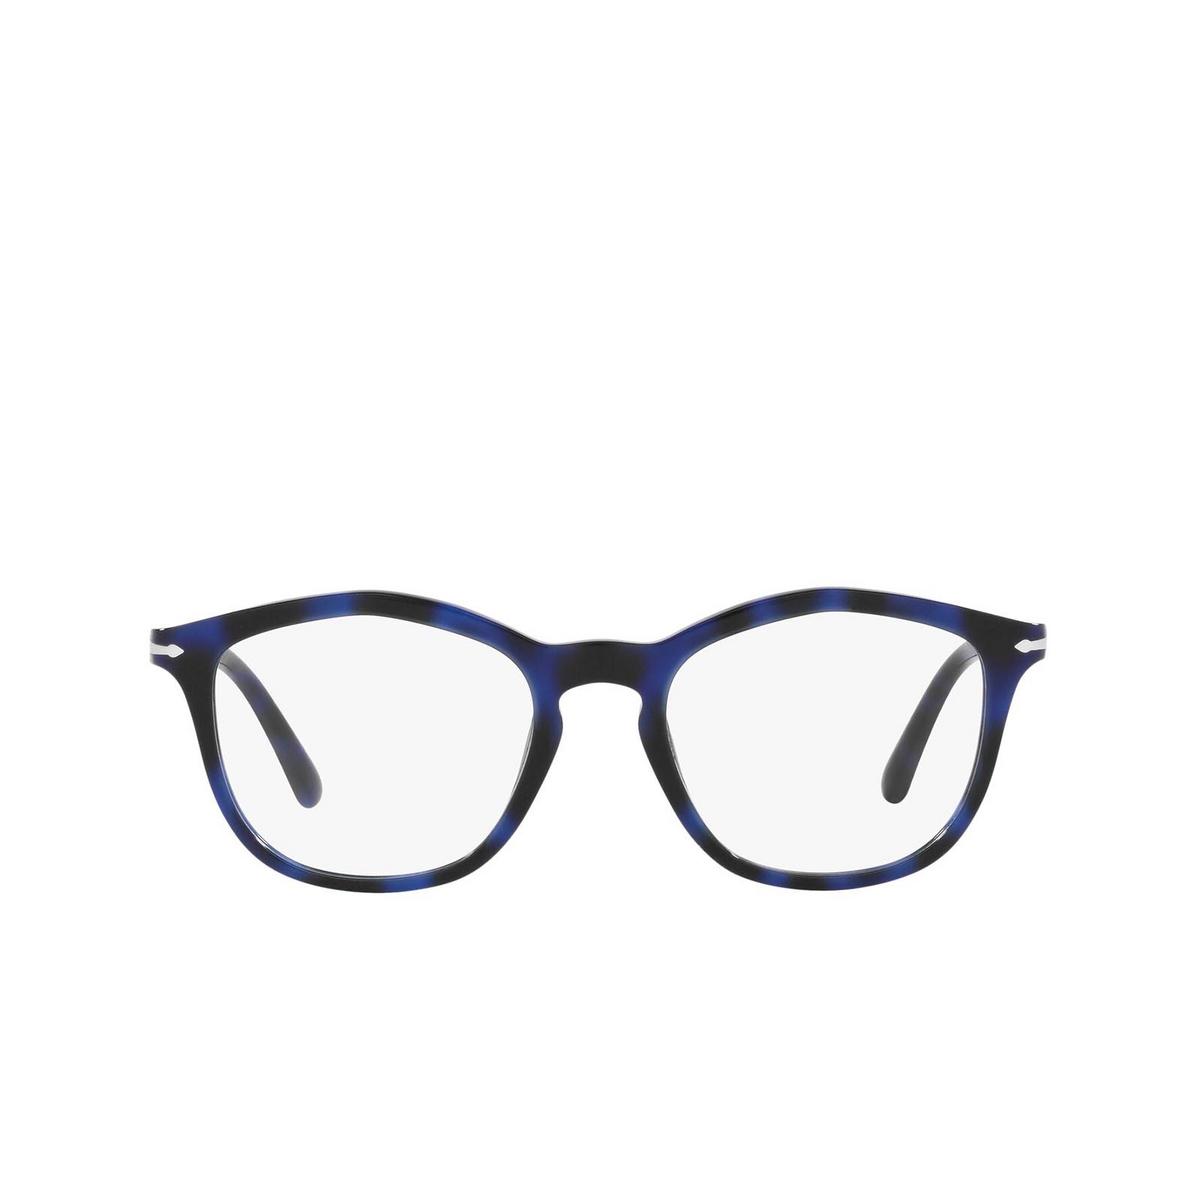 Persol® Irregular Eyeglasses: PO3267V color Spotted Blue 1099 - front view.